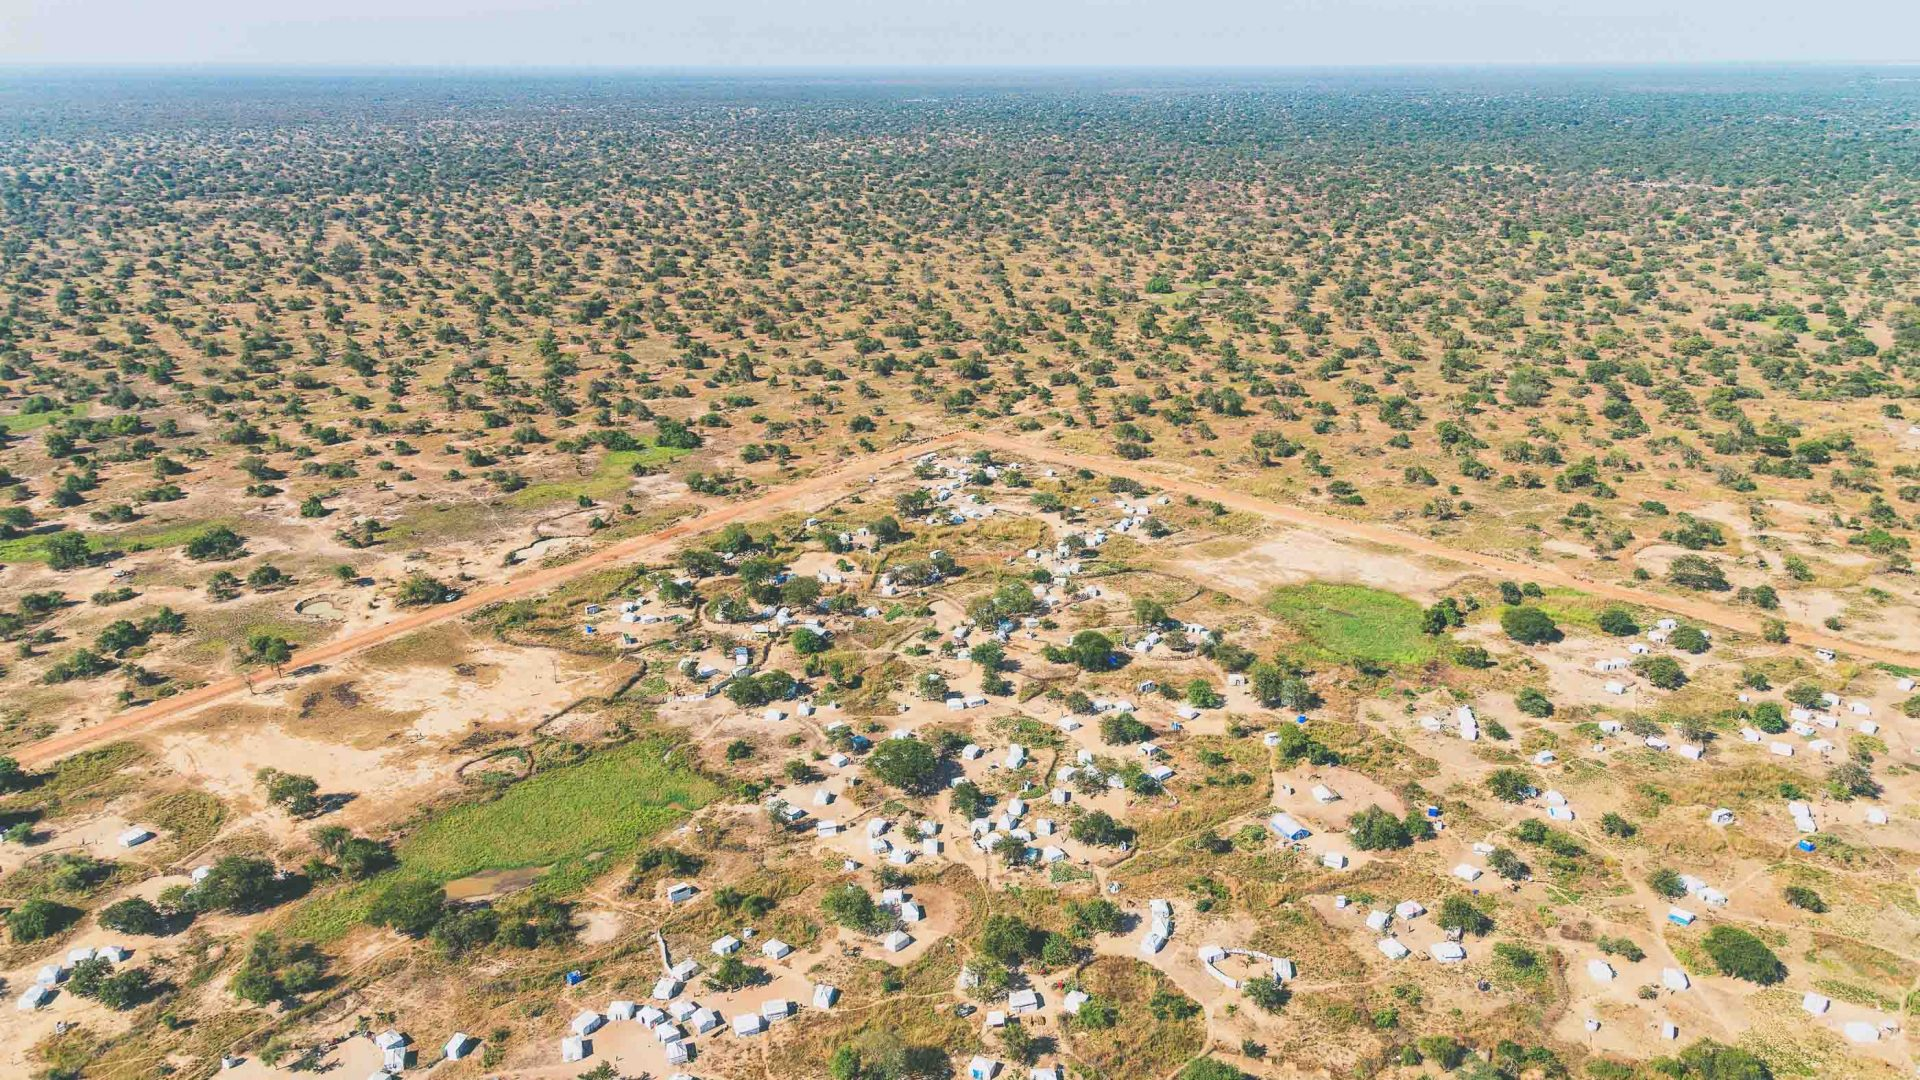 Aerial view over a Sudanese refugee camp.